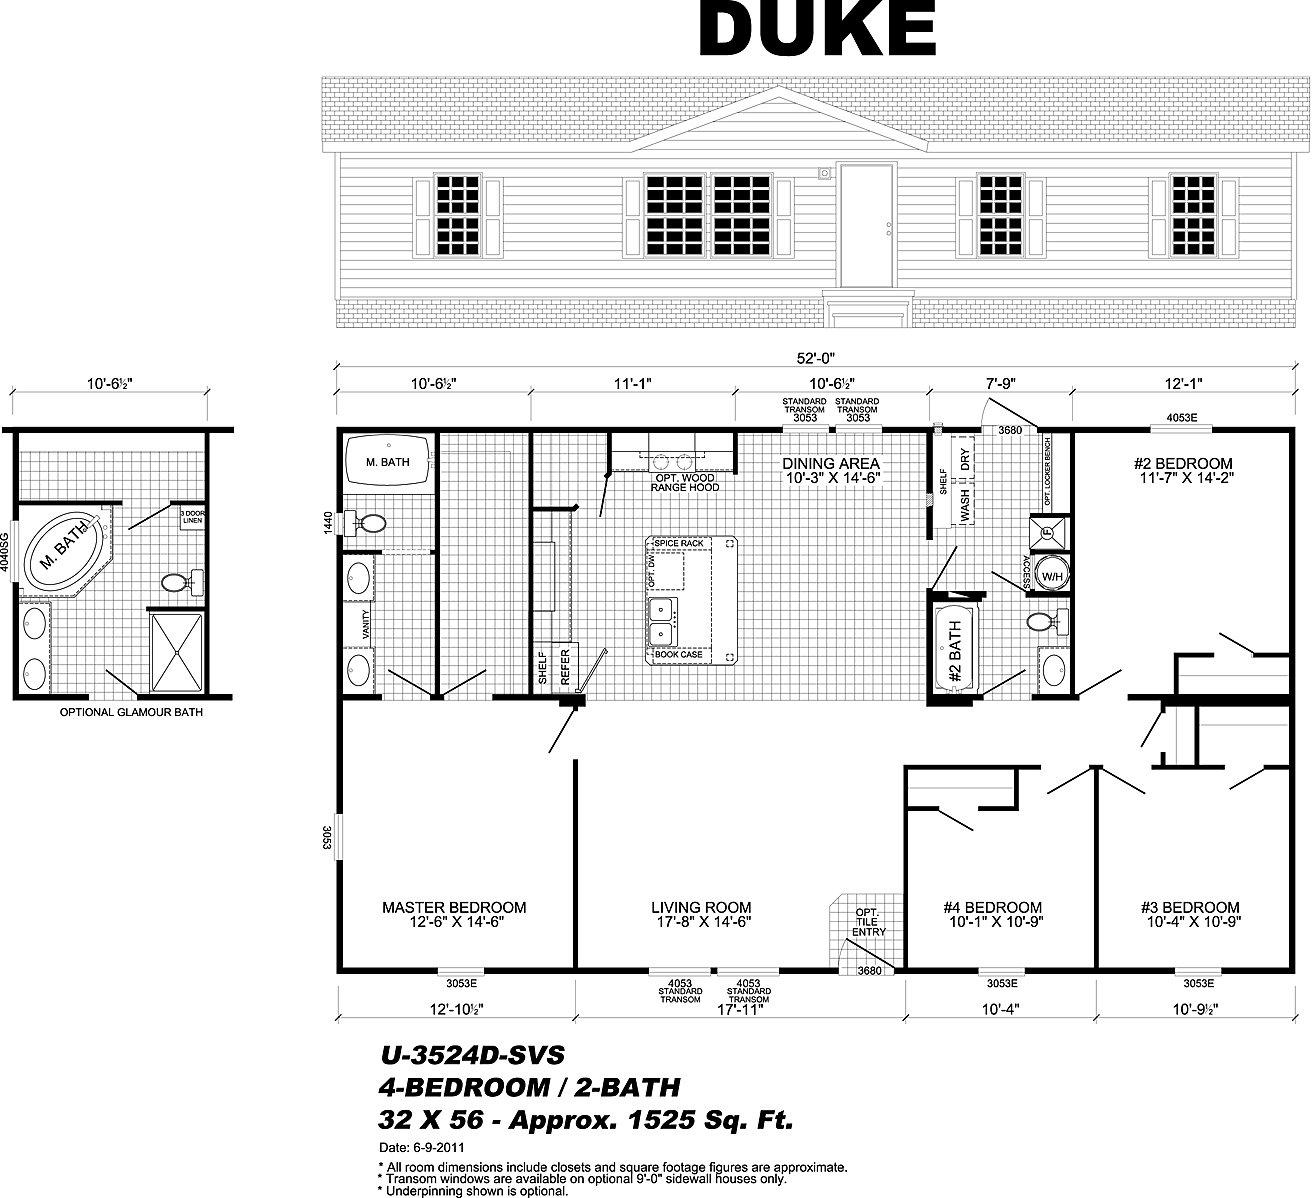 Rainbow homes augusta ga 4 bedroom for Designer homes augusta ga